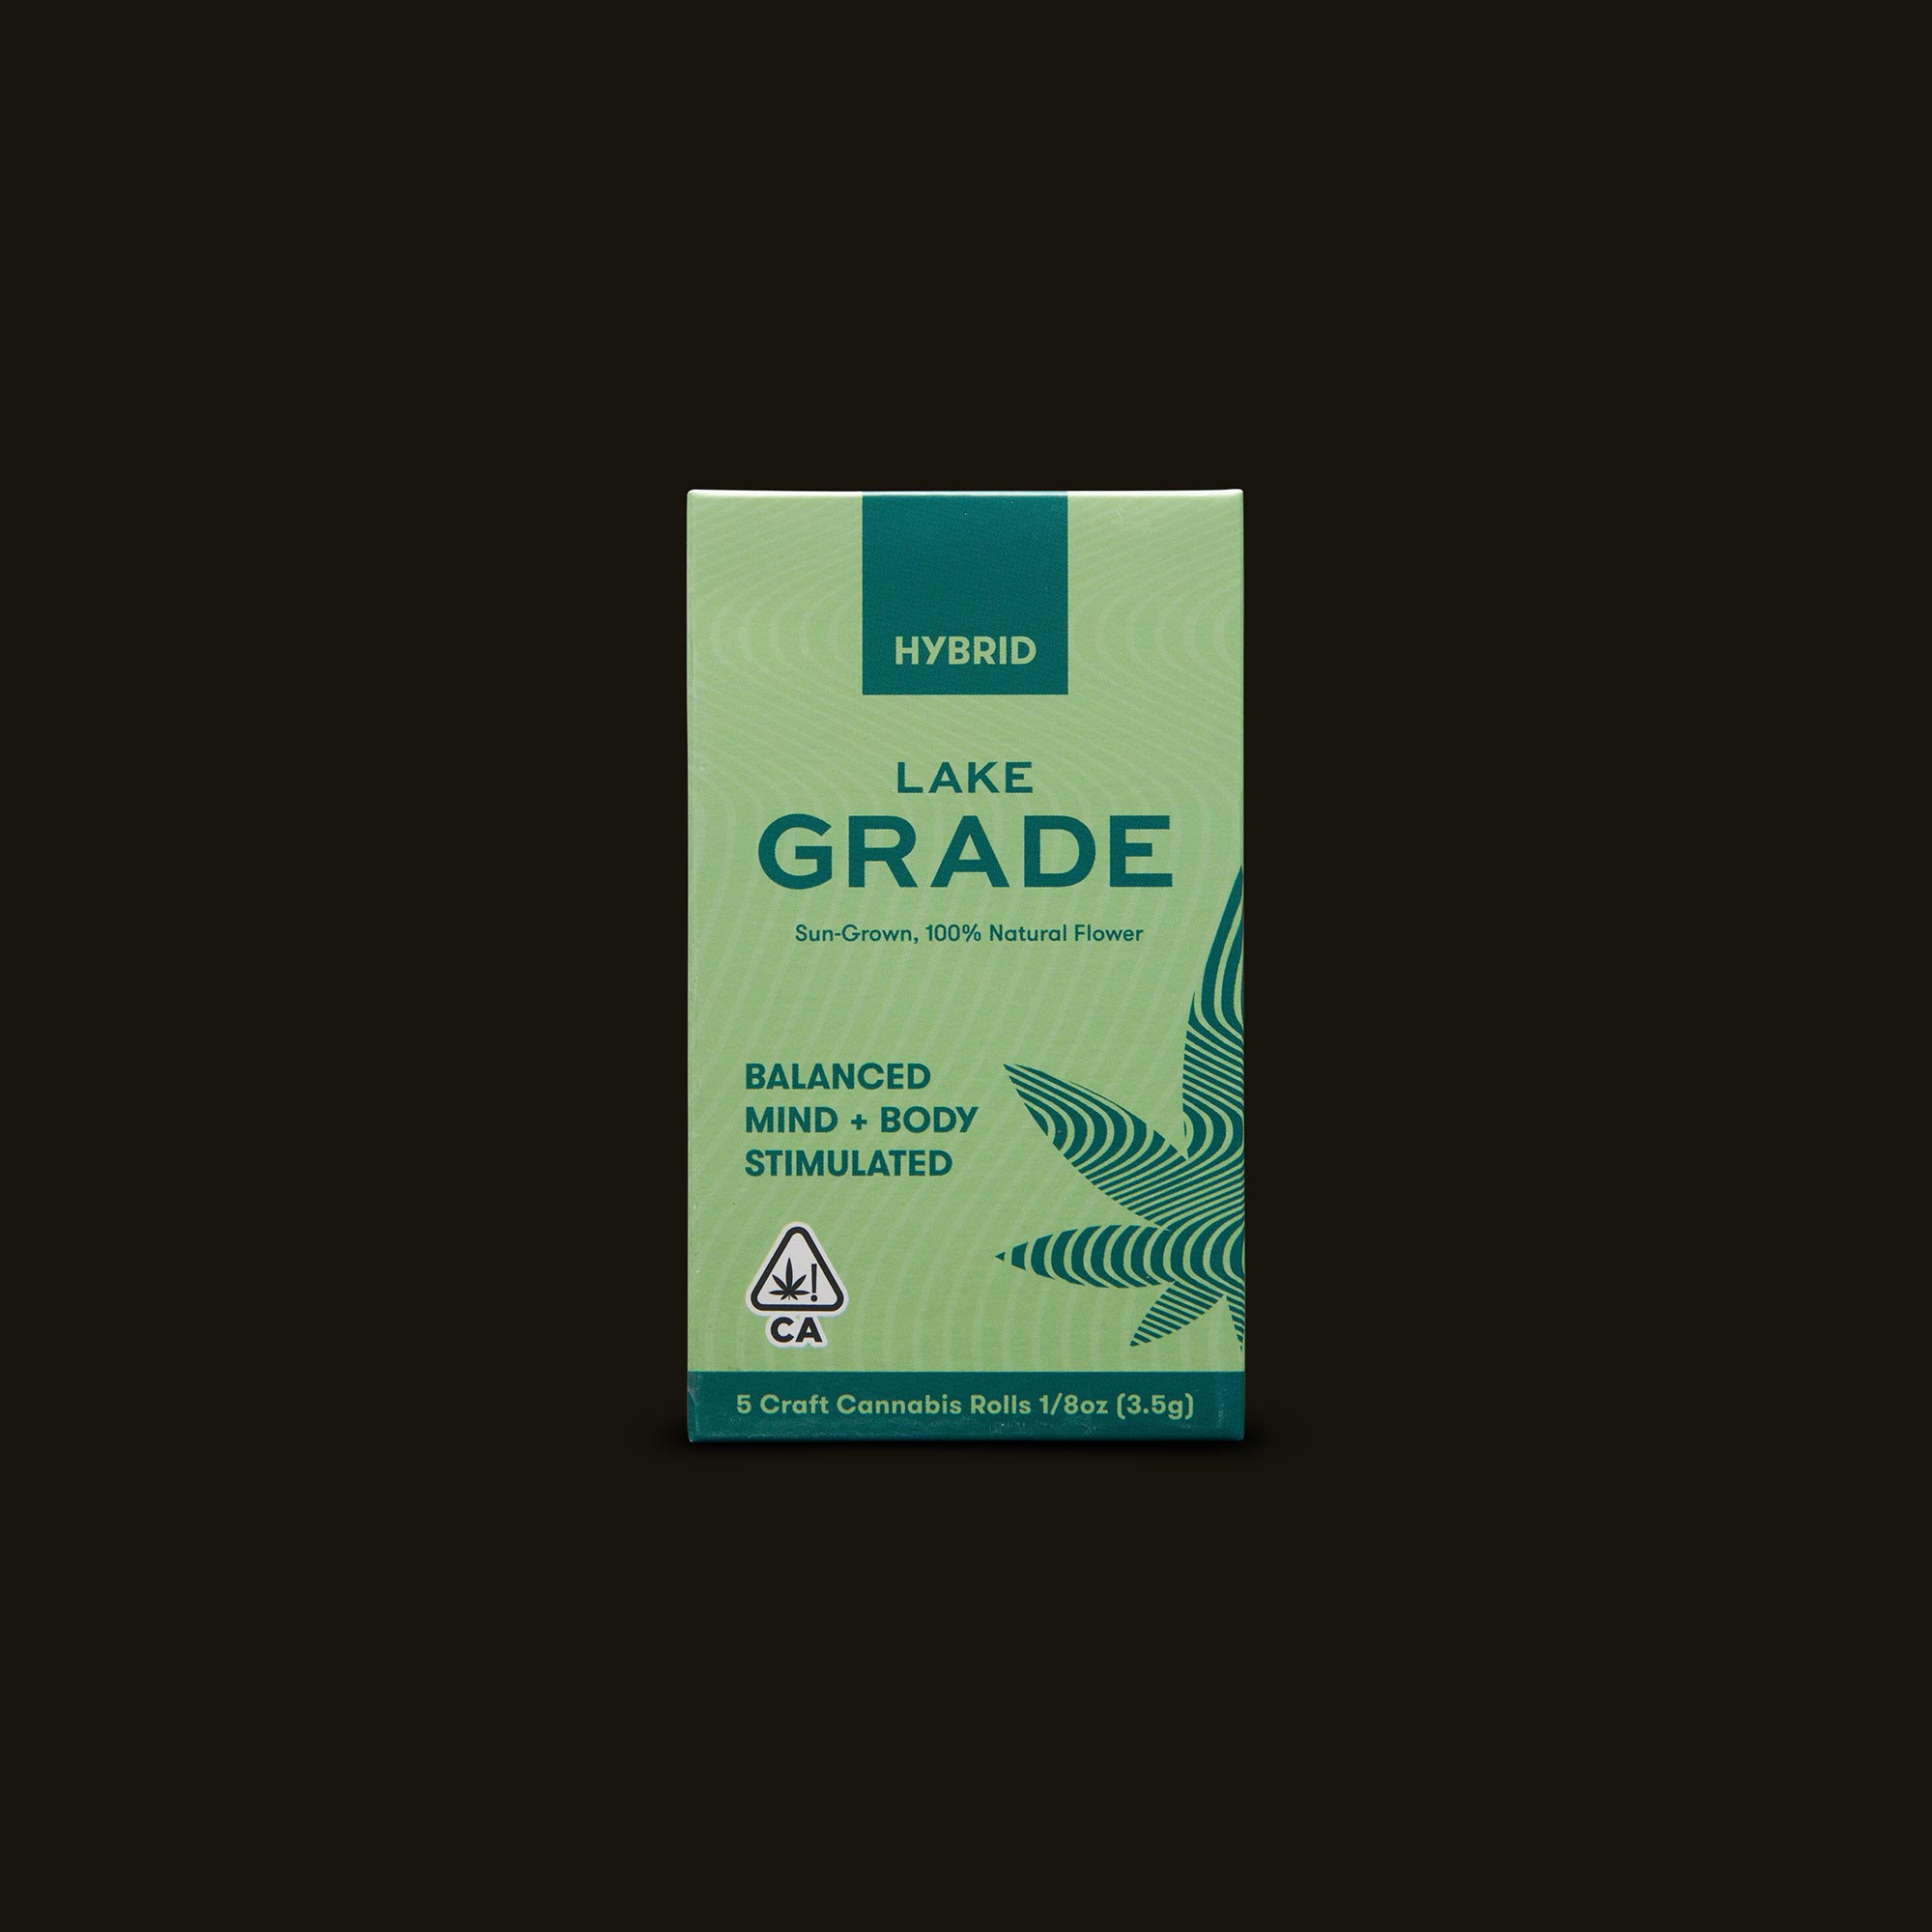 Lakegrade Banana Kush Pre-Roll 5-Pack Front Packaging